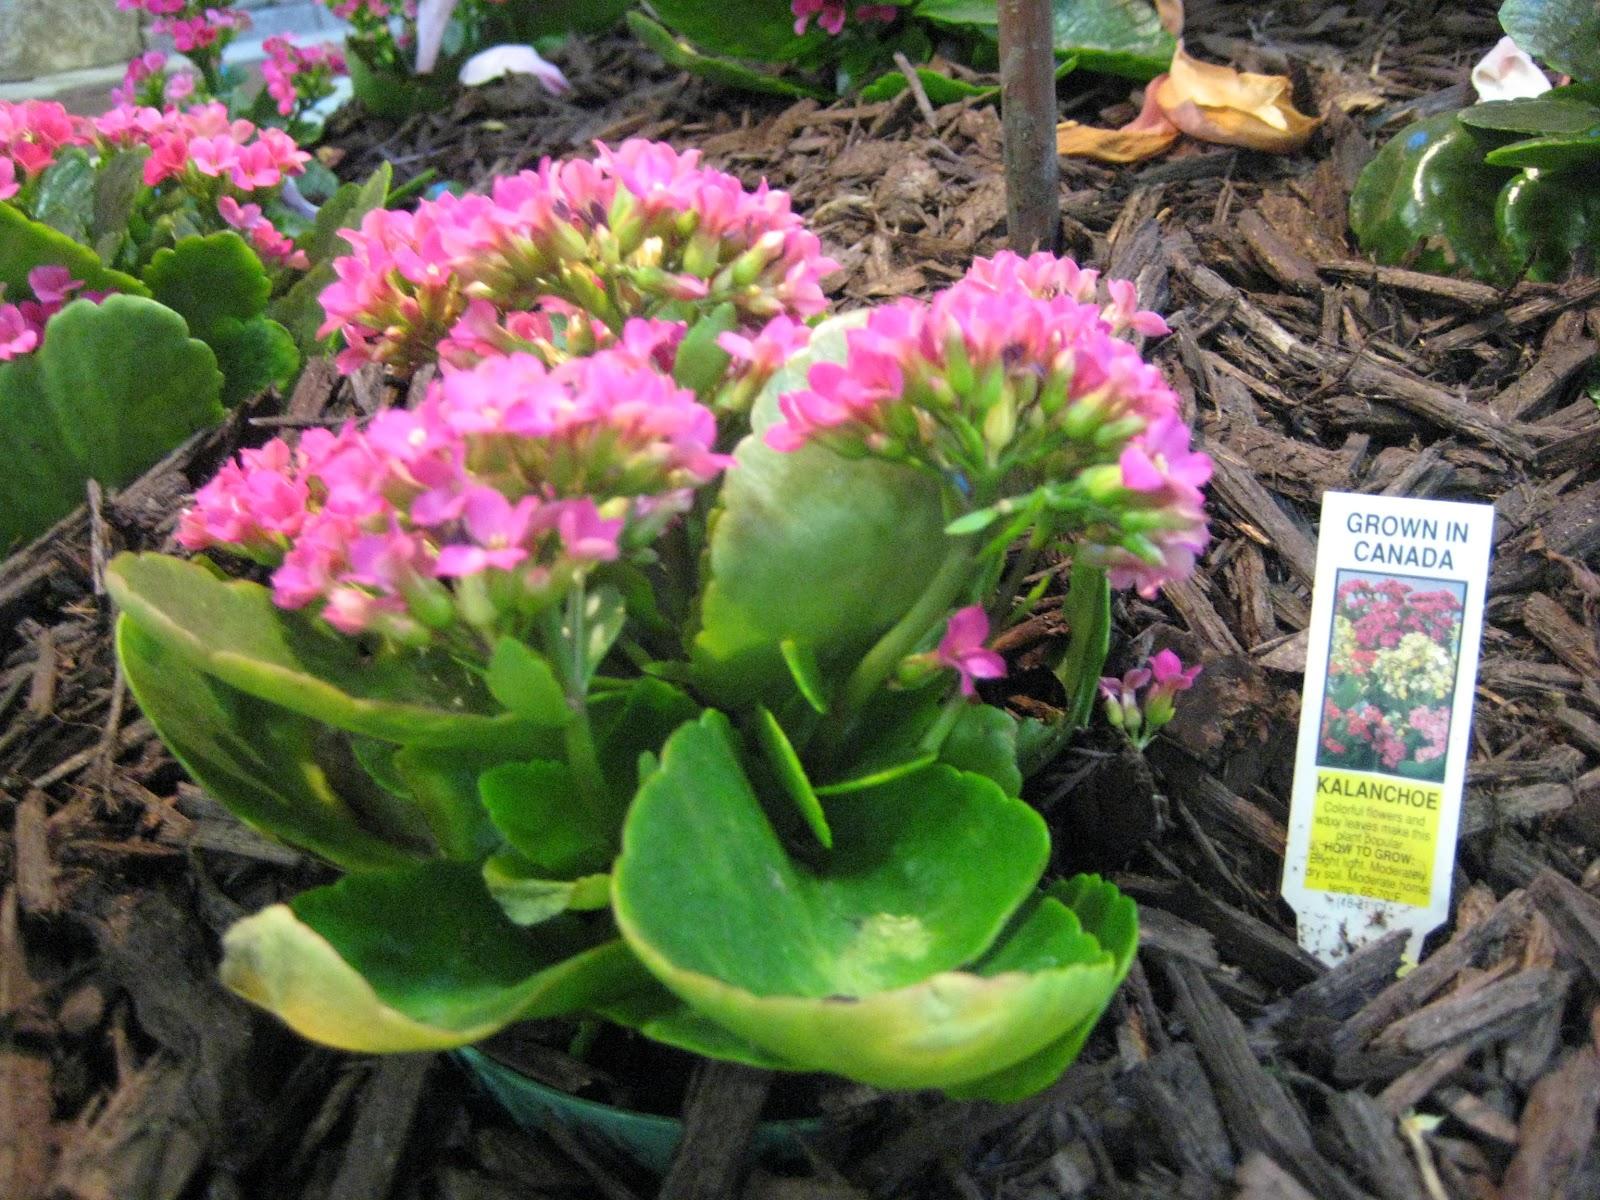 The parkland project 2012 realtors home and garden show - Flowering succulent house plants ...